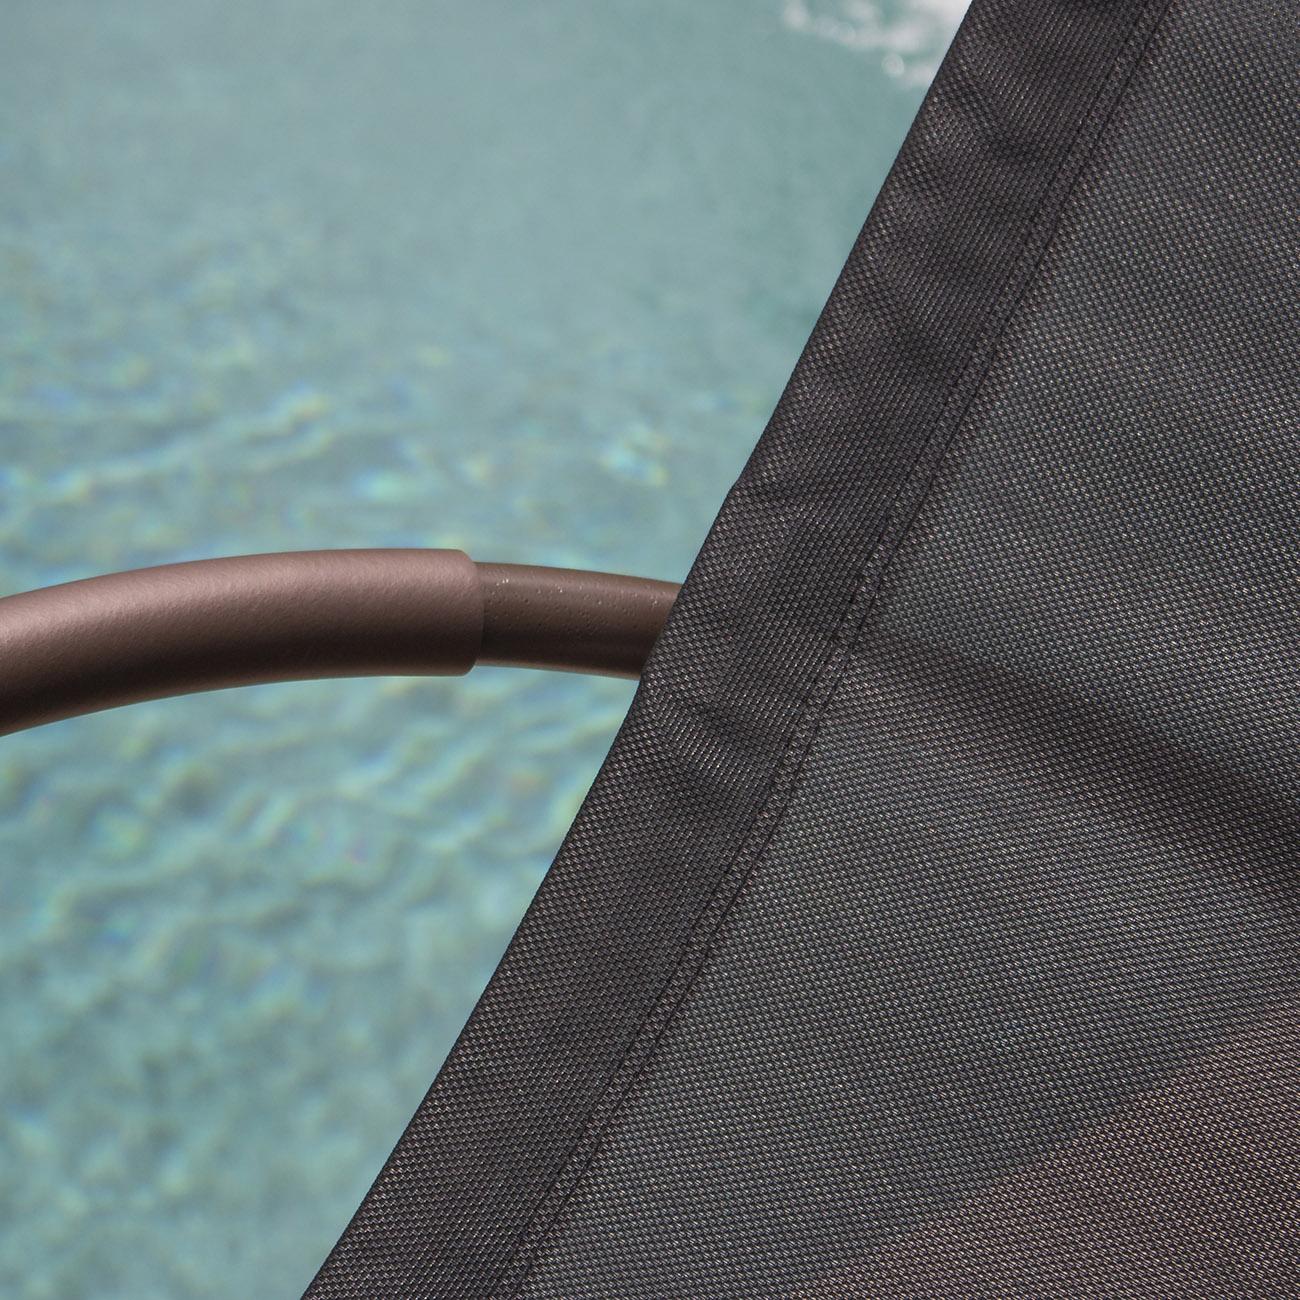 anti gravity pool chair pokemon snorlax bean bag 7 color orbital zero lounge beach